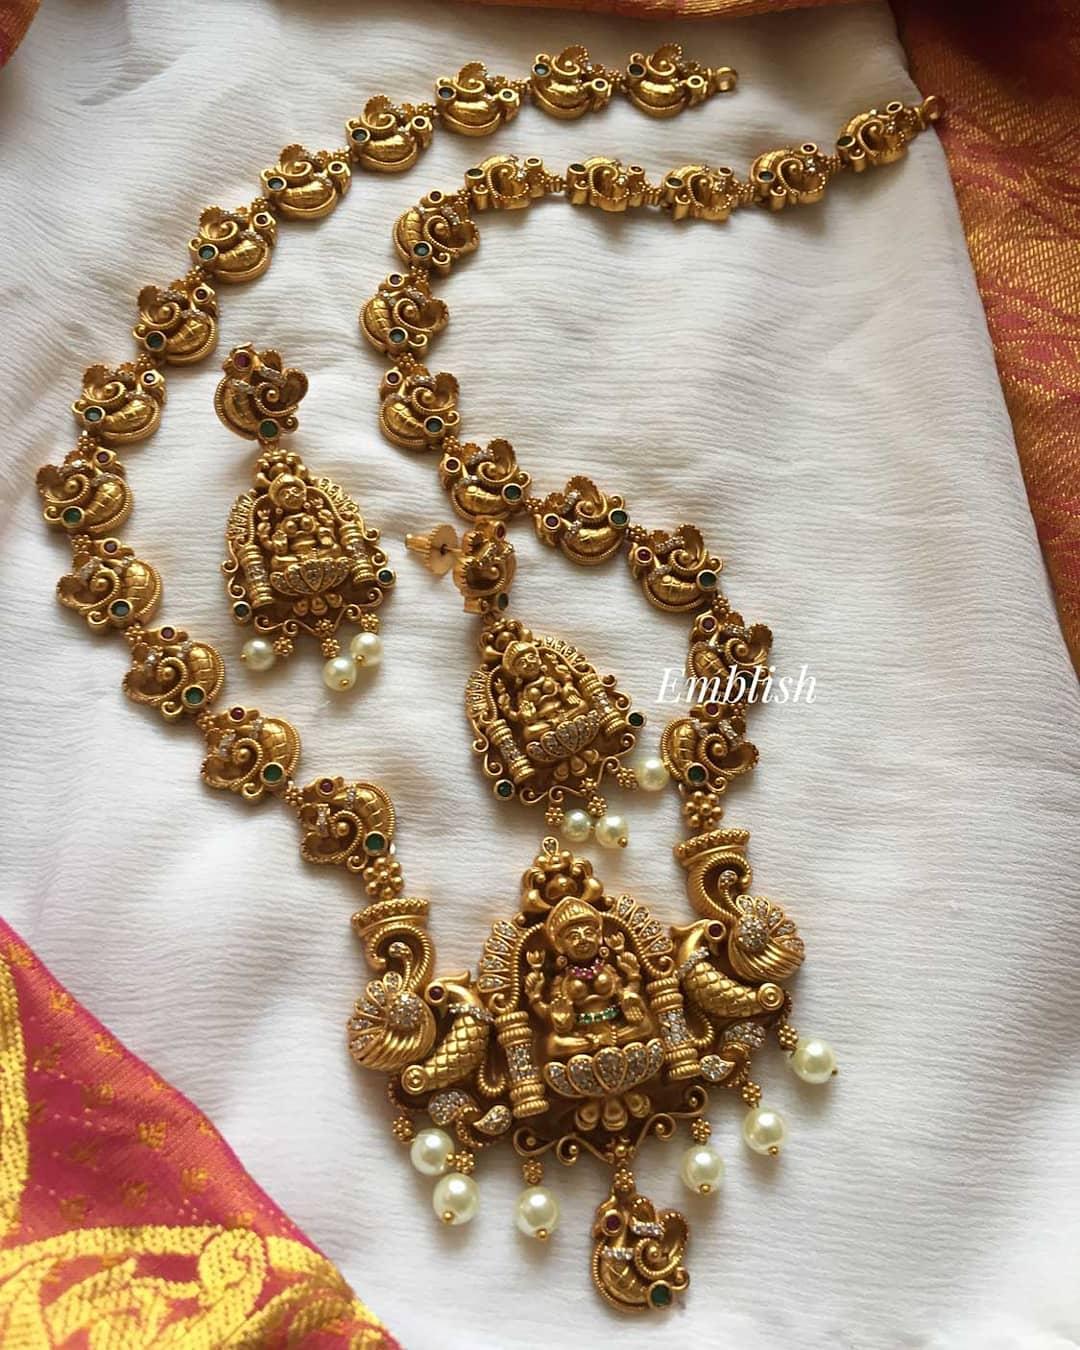 gold-alike-lakshmi-peacock-necklace-set